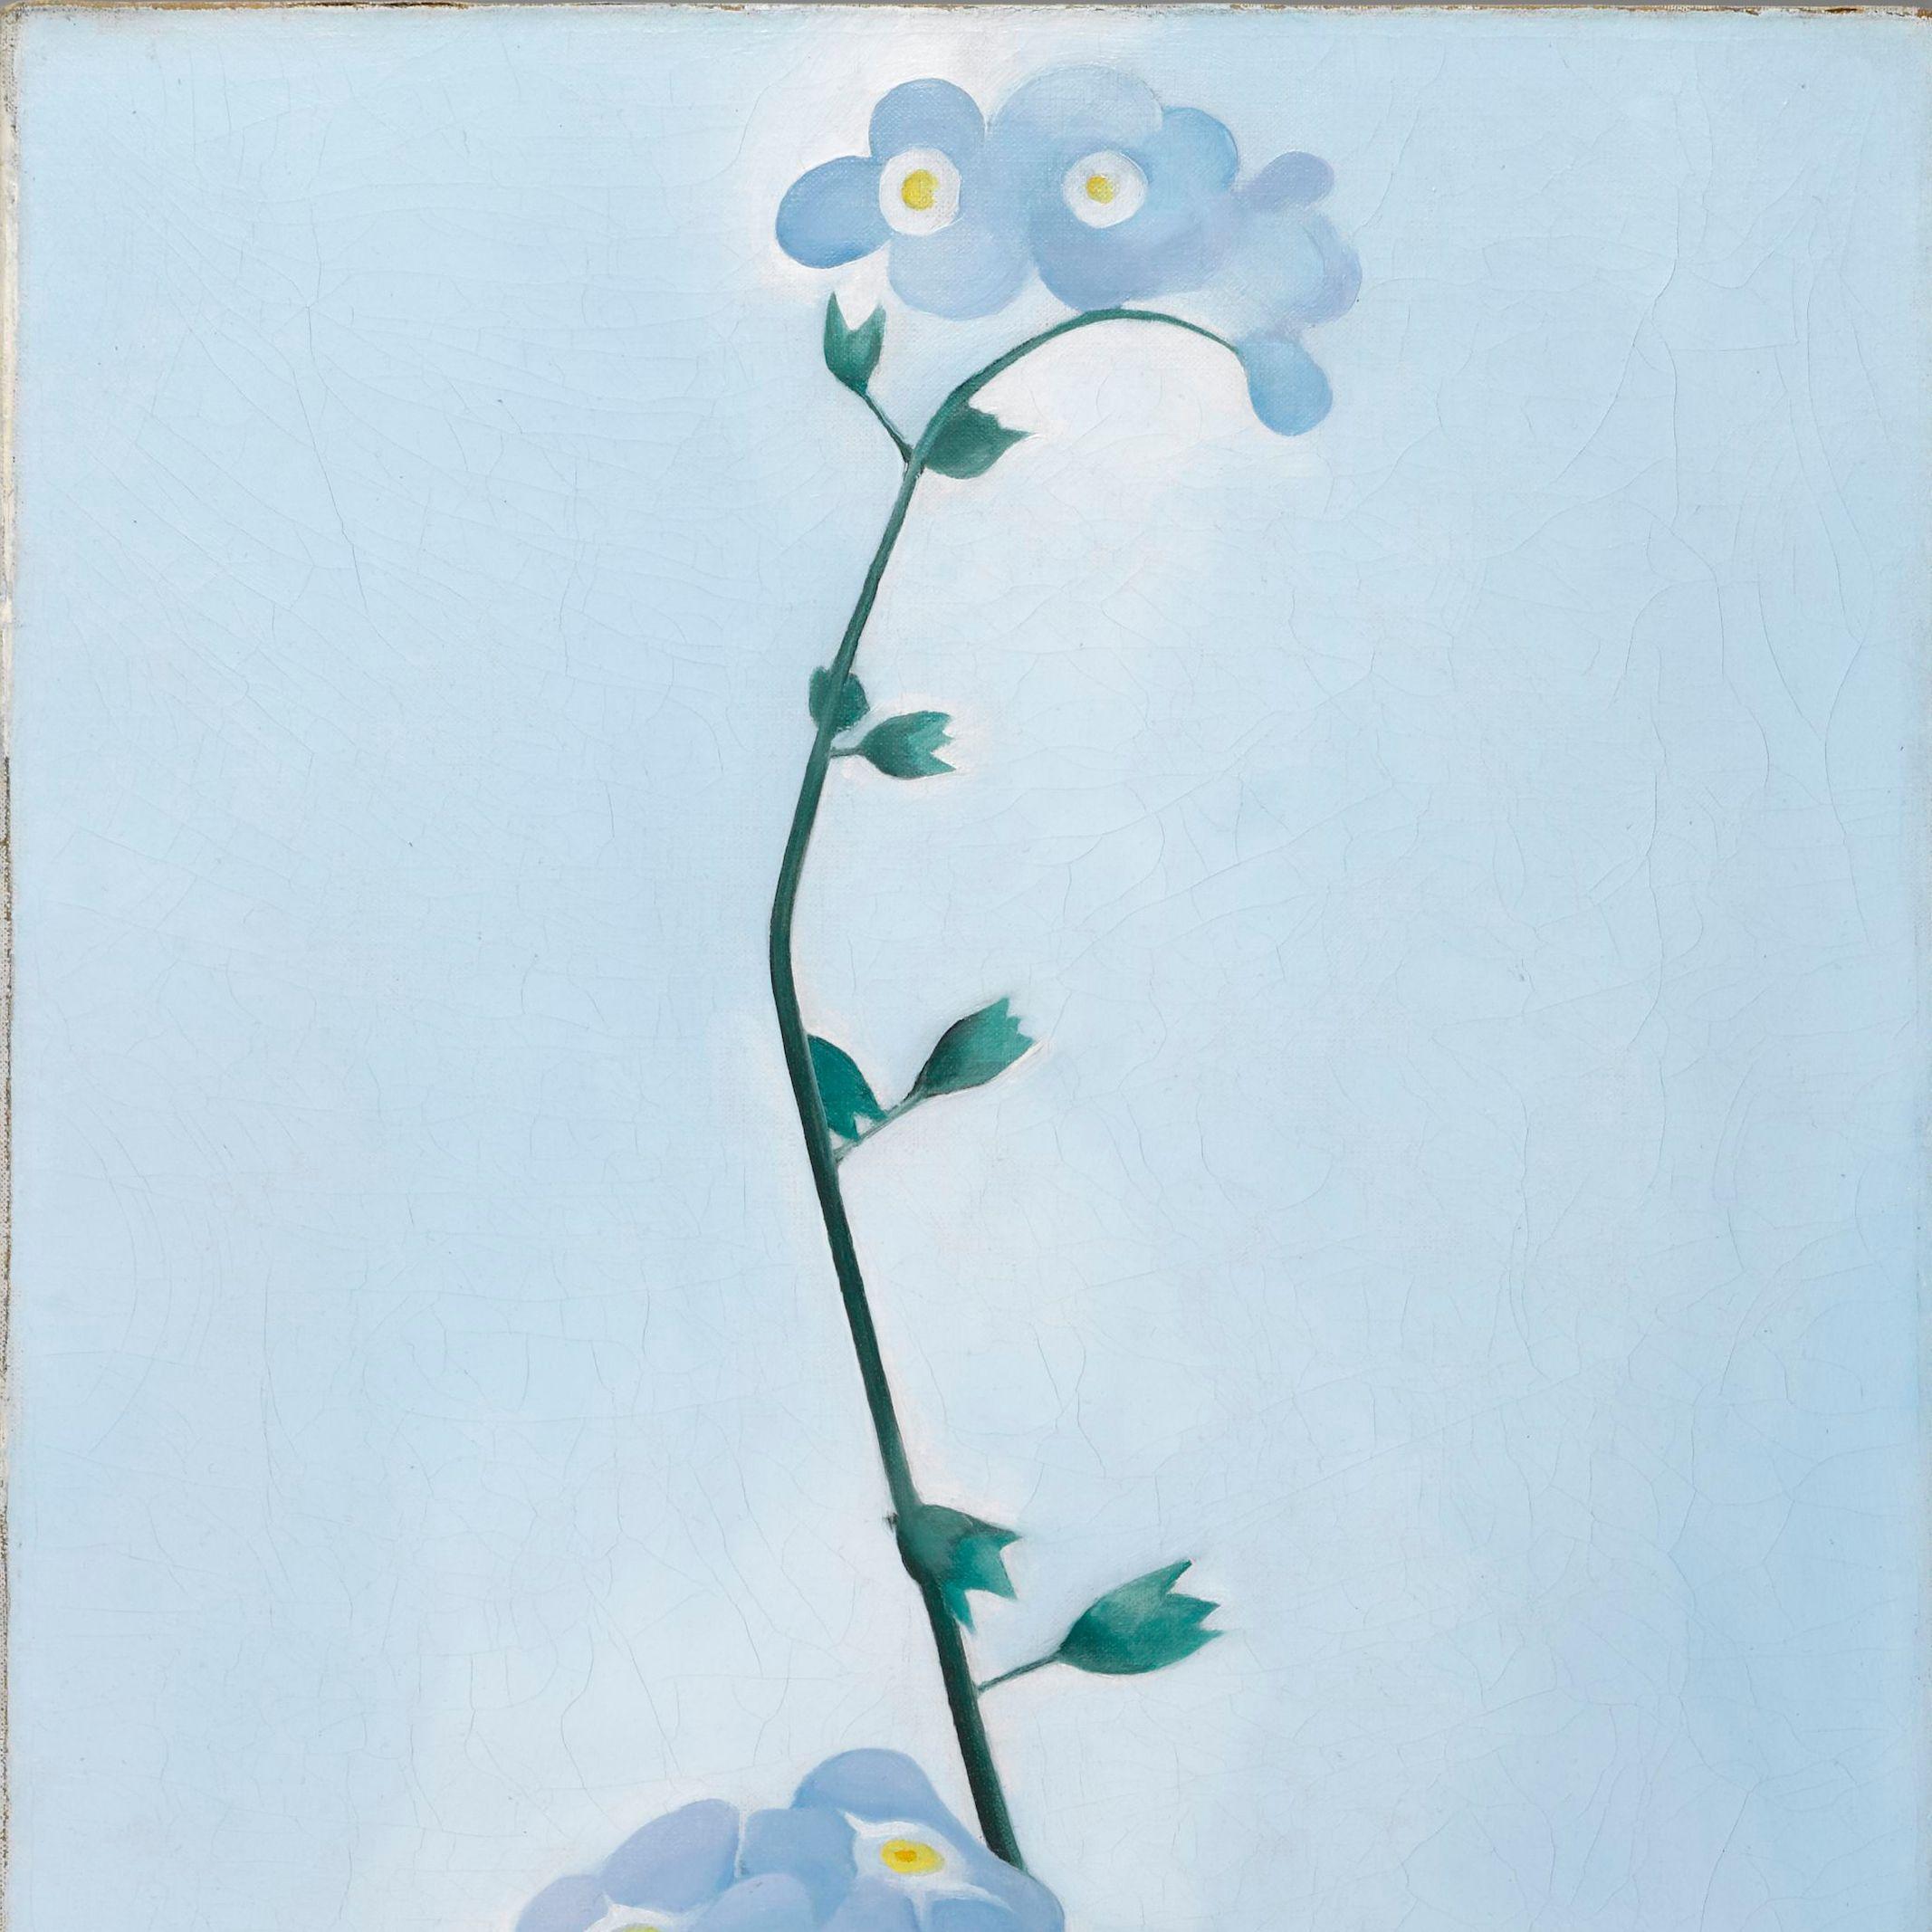 "<p>Georgia O'Keeffe (American, 1887-1986). <em data-redactor-tag=""em"" data-verified=""redactor"">Black Pansy &amp&#x3B; Forget Me-Nots (Pansy)</em>, 1926. Oil on canvas, 27 1/8 x 12 1/4 in. (68.9 x 31.1 cm). Brooklyn Museum&#x3B; Gift of Mrs. Alfred S. Rossin, 28.521. (Photo: Christine Gant, Brooklyn Museum).&nbsp&#x3B;</p>"